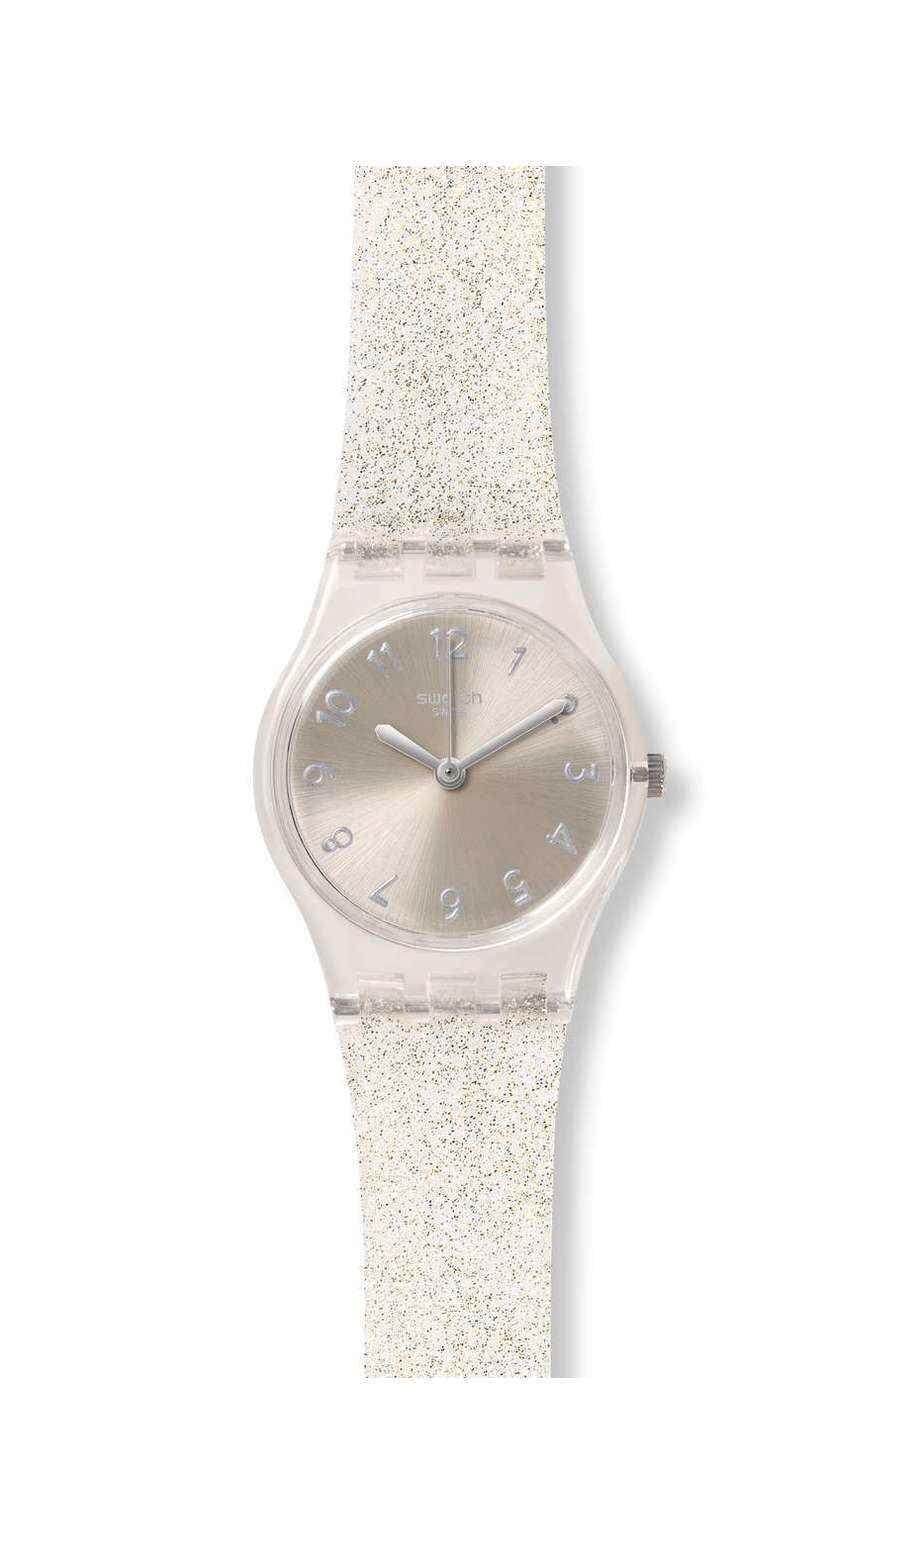 Swatch - SILVER GLISTAR TOO - 1